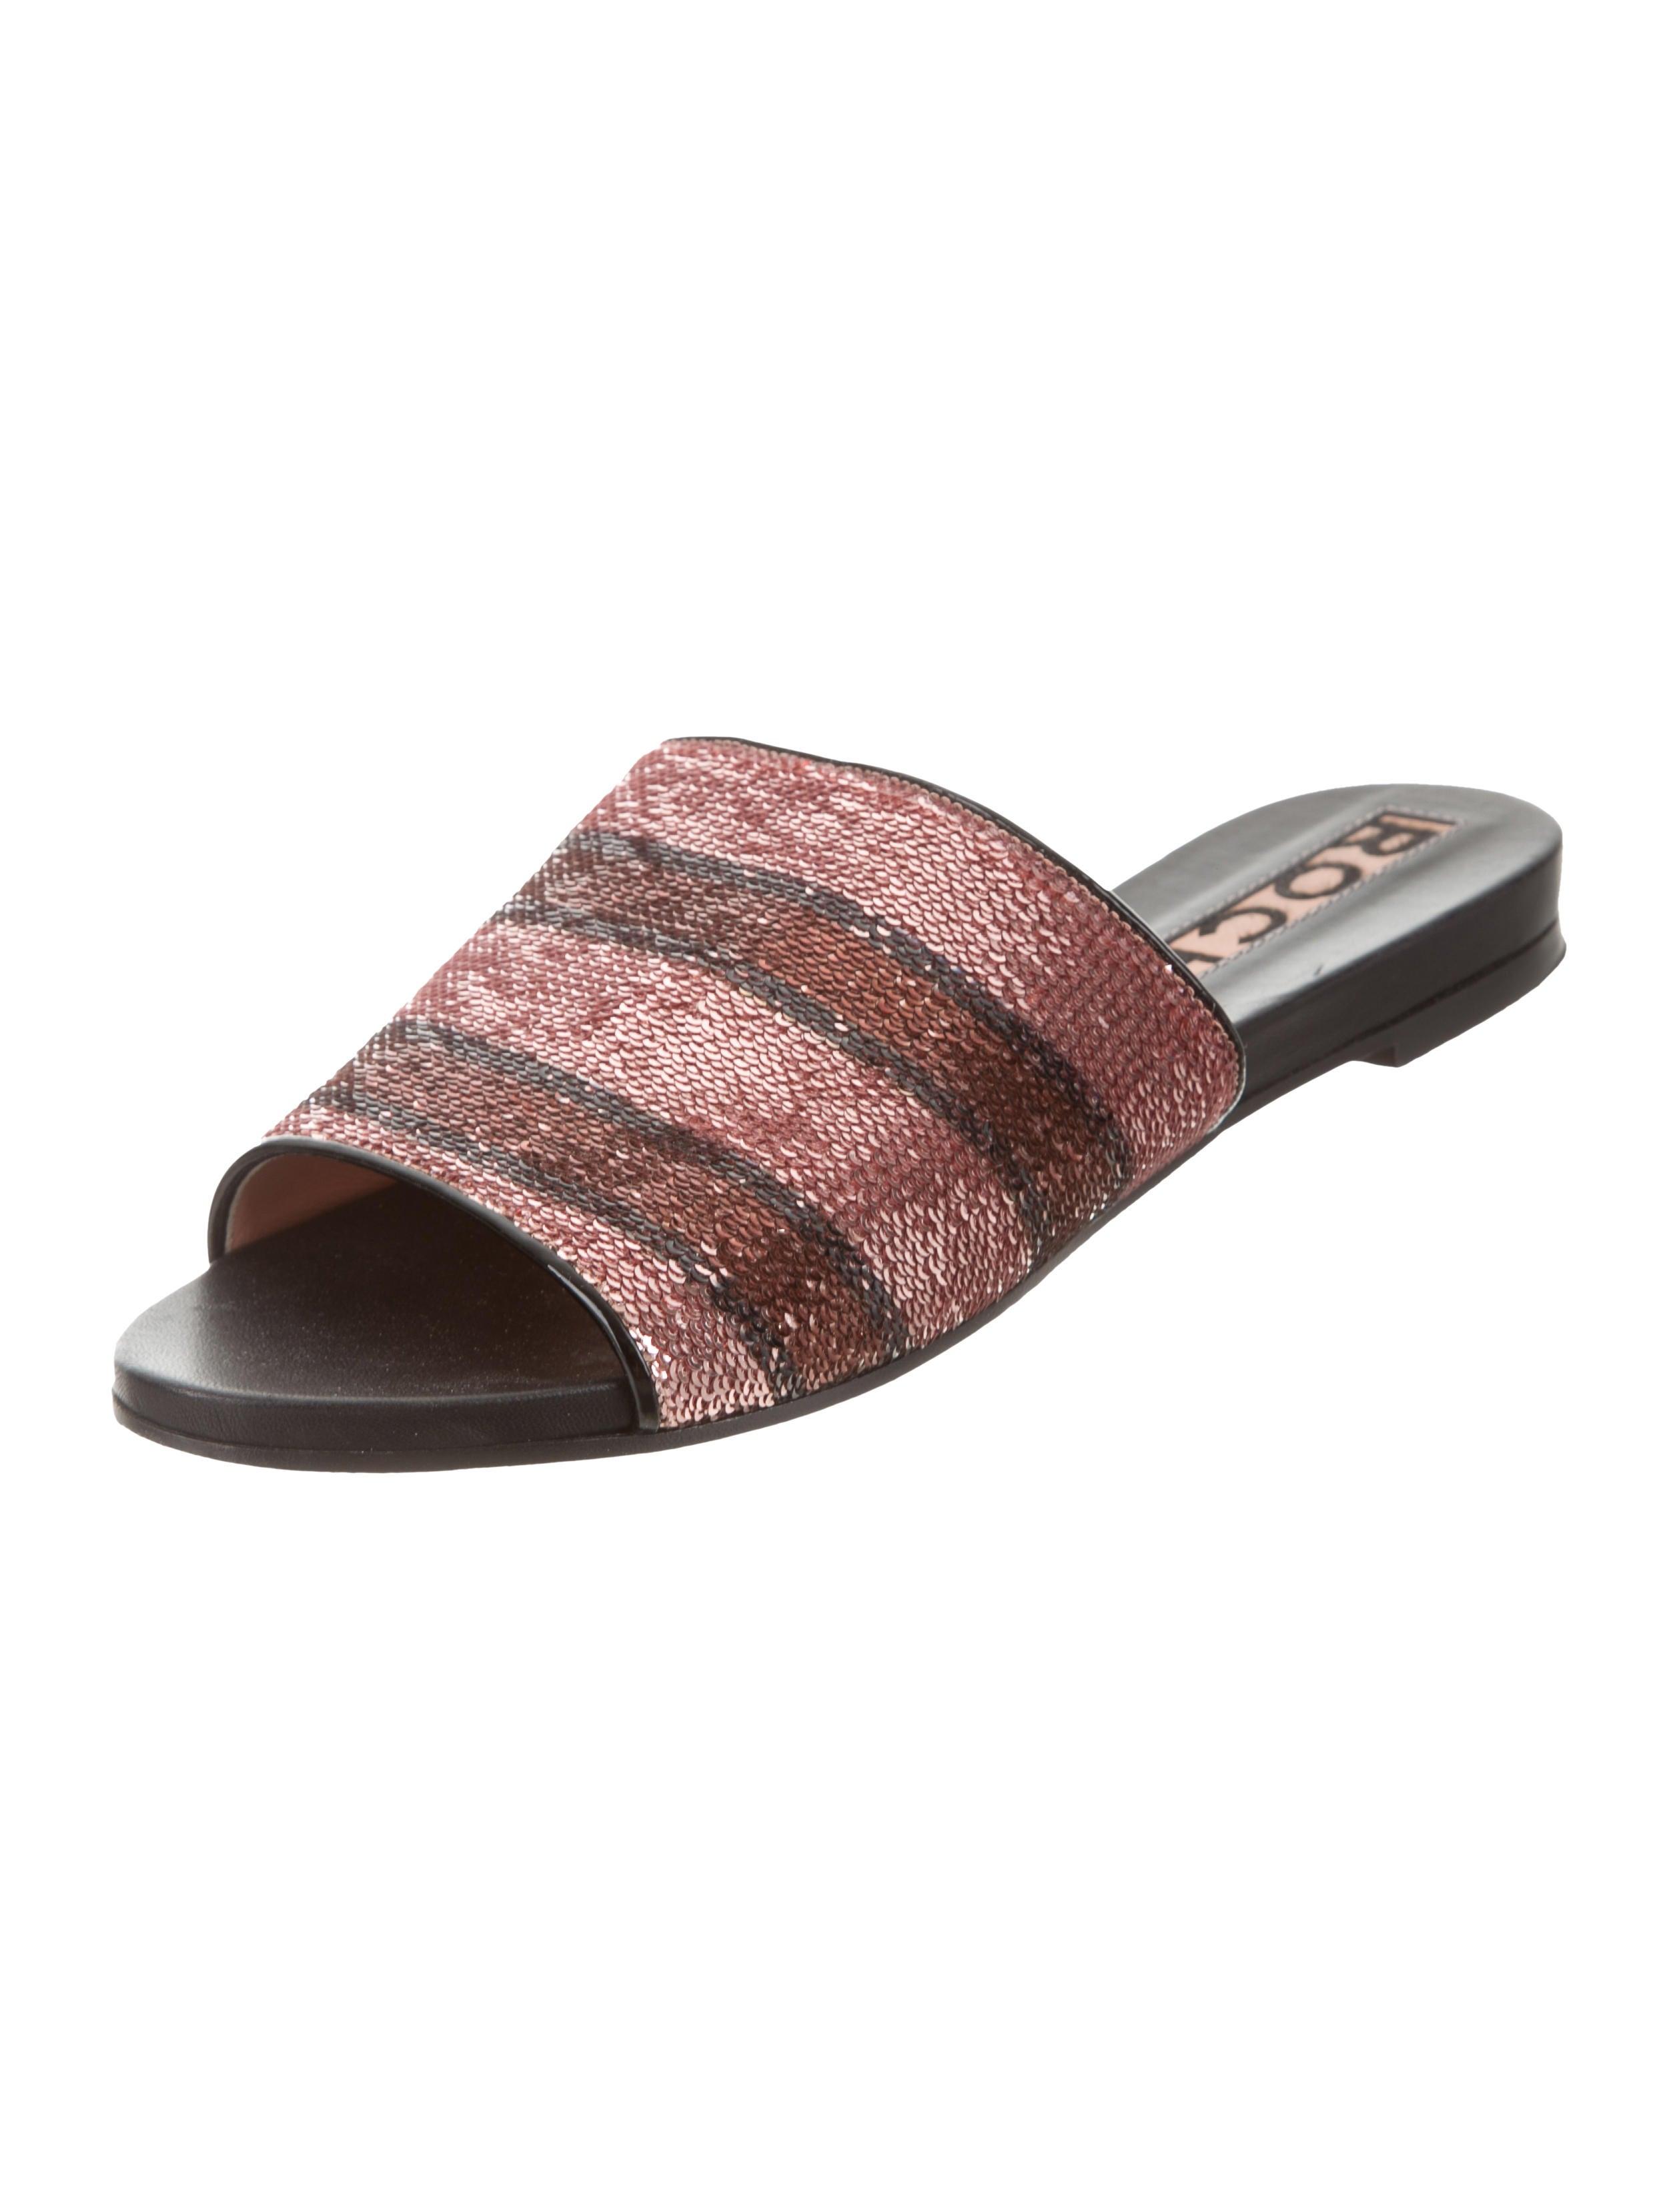 Rochas Sequin Slide Sandals clearance ebay 899Gu317pK